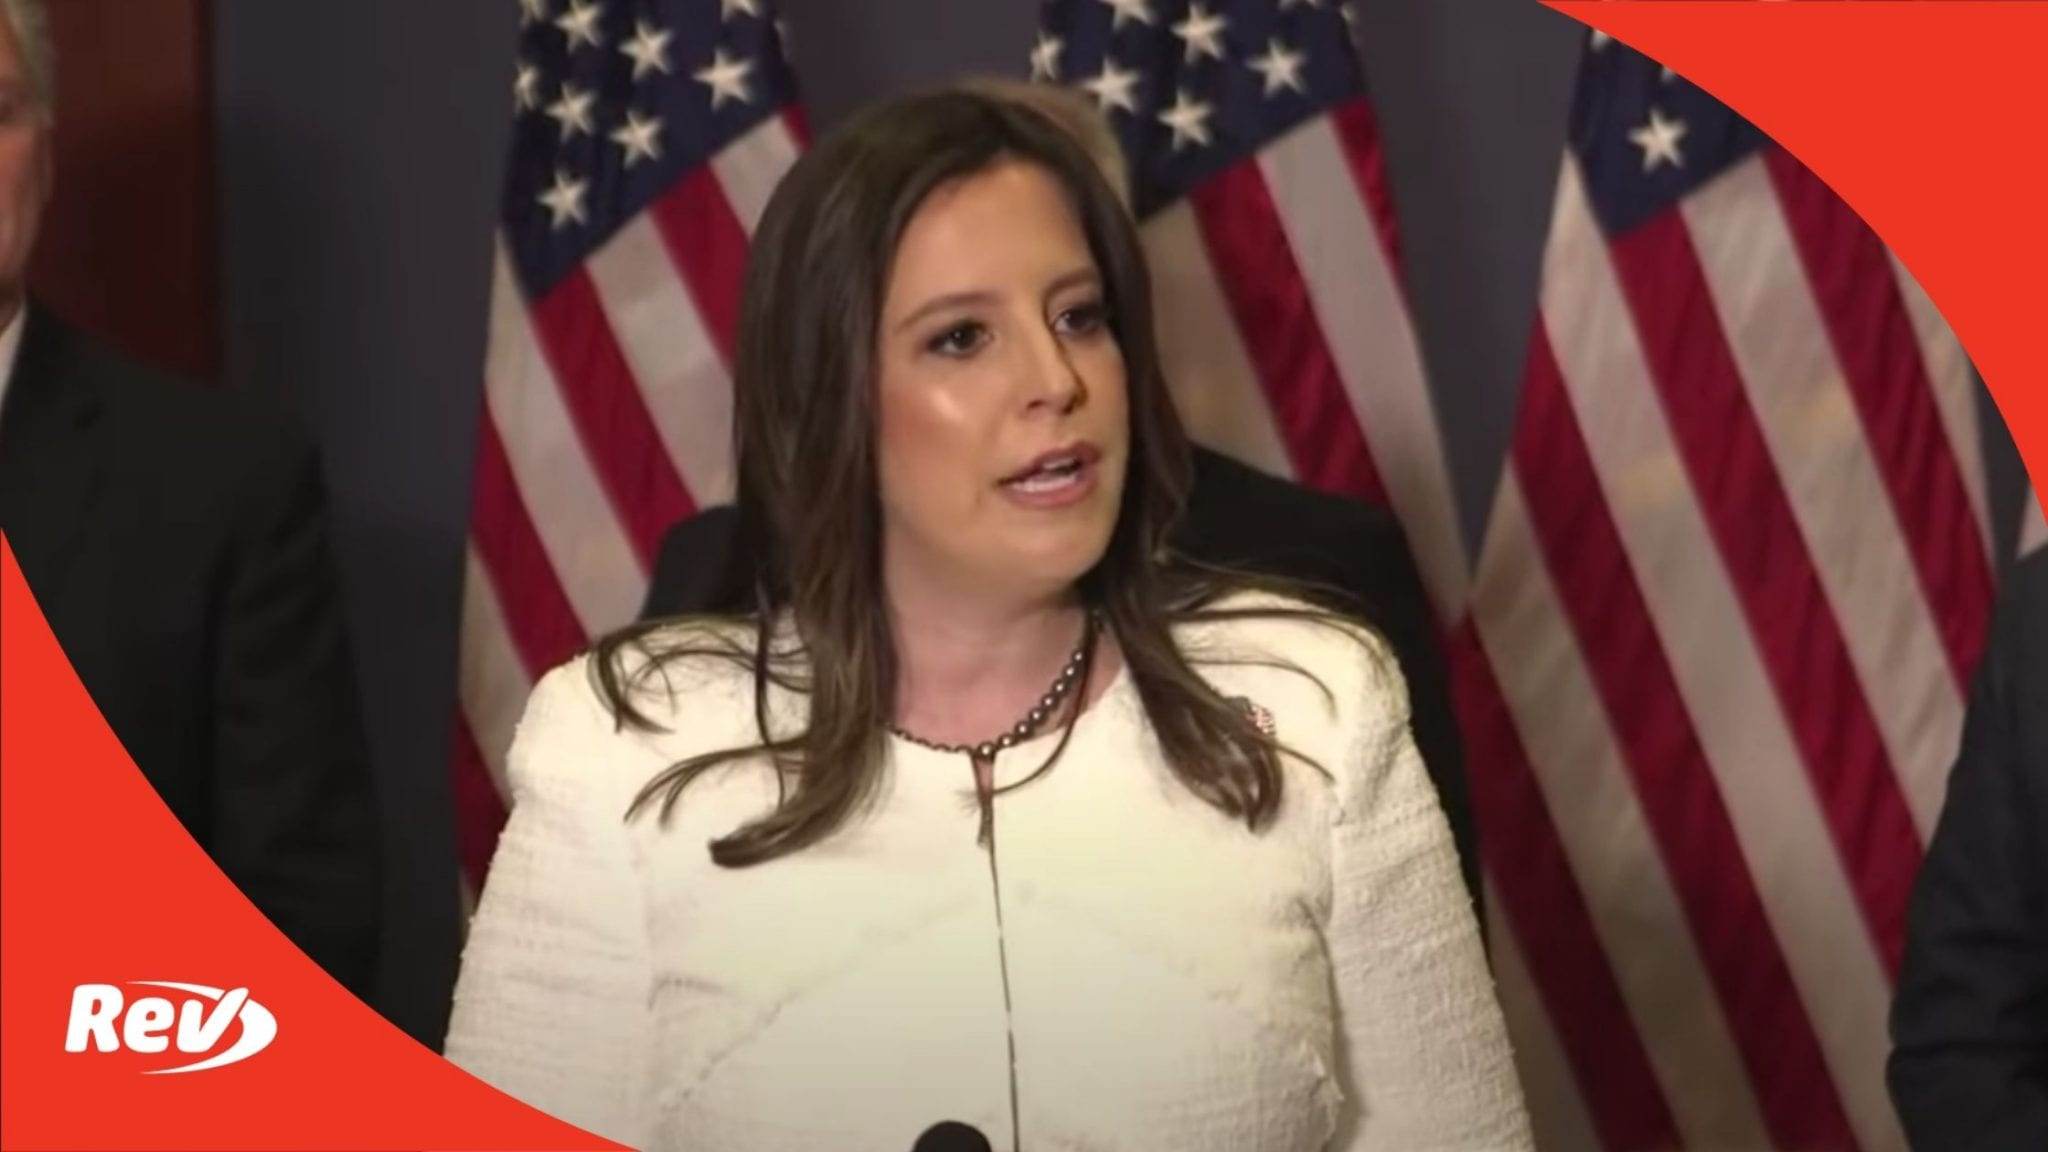 Elise Stefanik Replaces Liz Cheney in GOP Leadership Press Conference Transcript